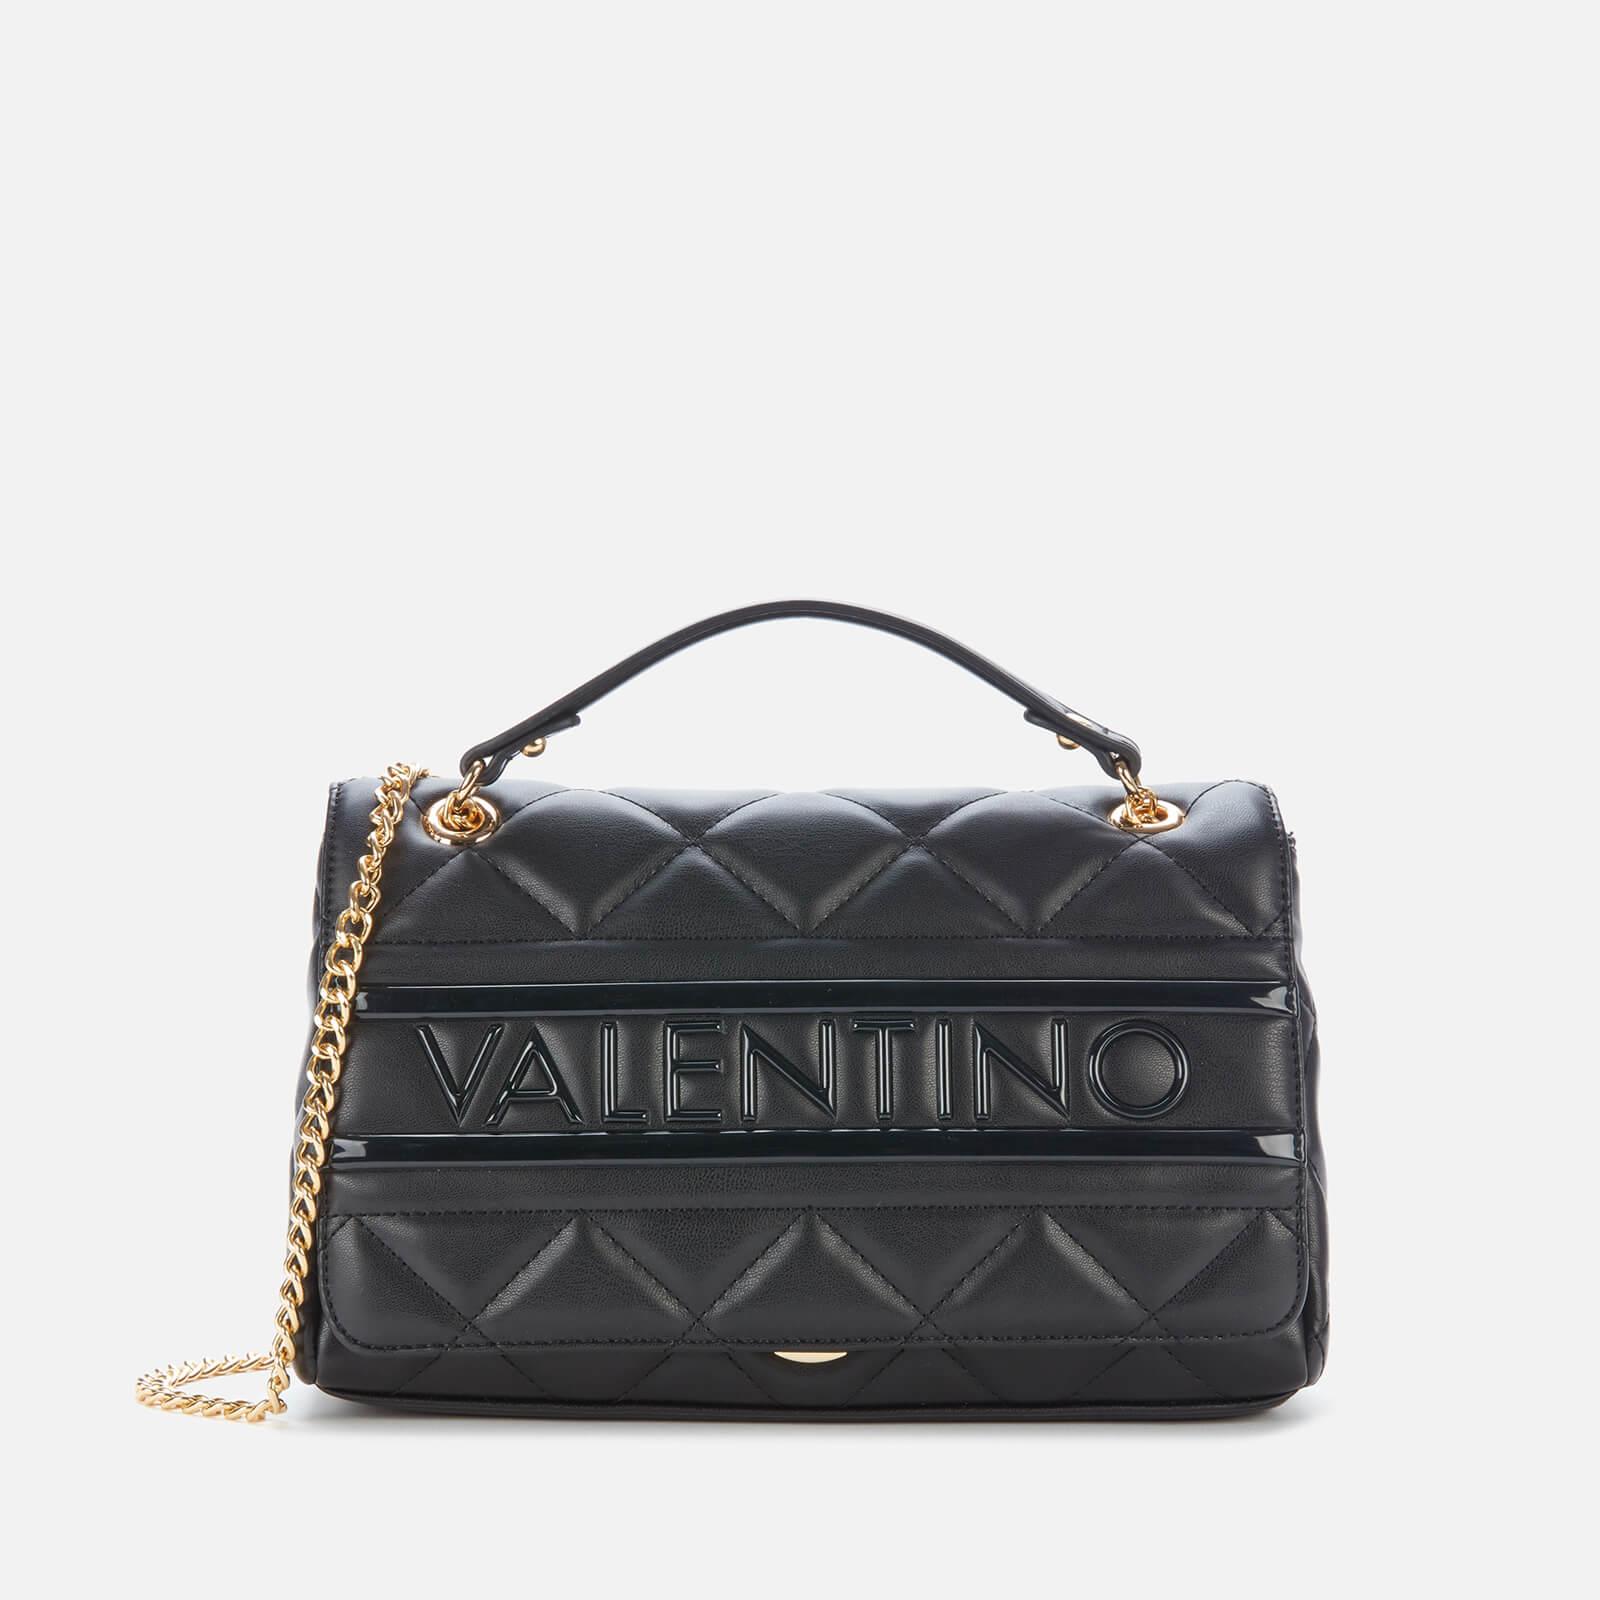 Valentino Bags Women's Ada Cross Body Bag - Black